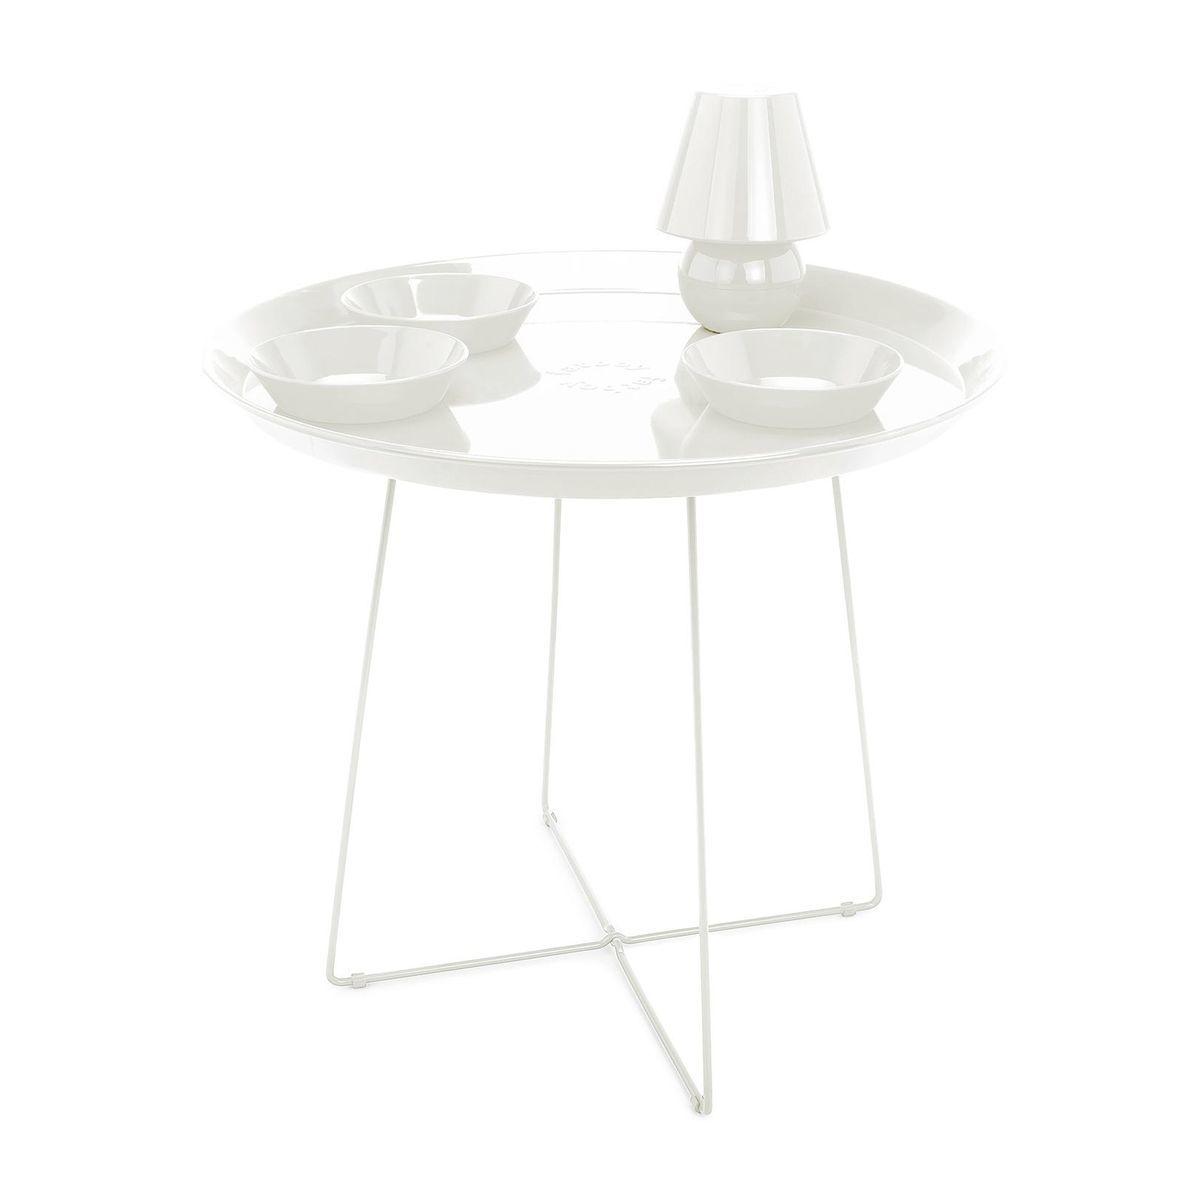 snacklight lampe de table avec tableau fatboy. Black Bedroom Furniture Sets. Home Design Ideas